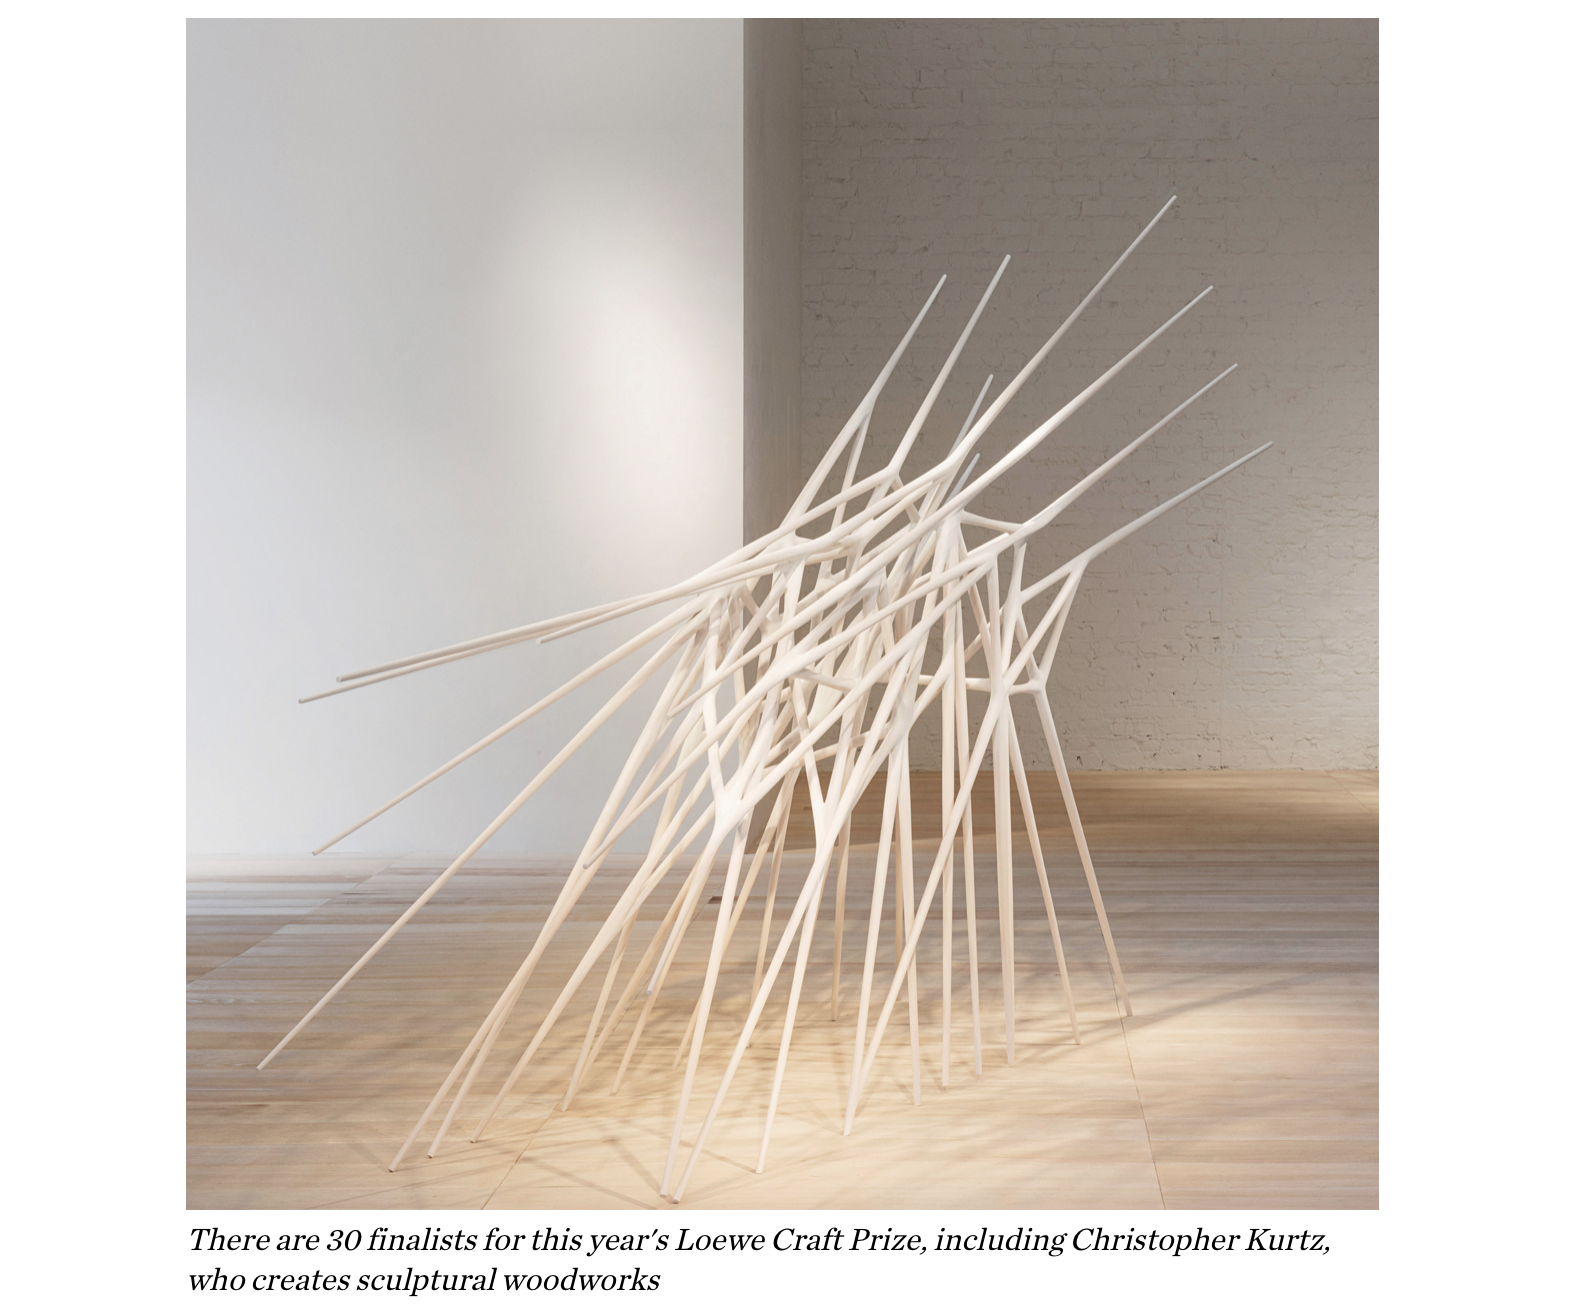 Christopher Kurtz's sculpture featured in Dezeen magazine